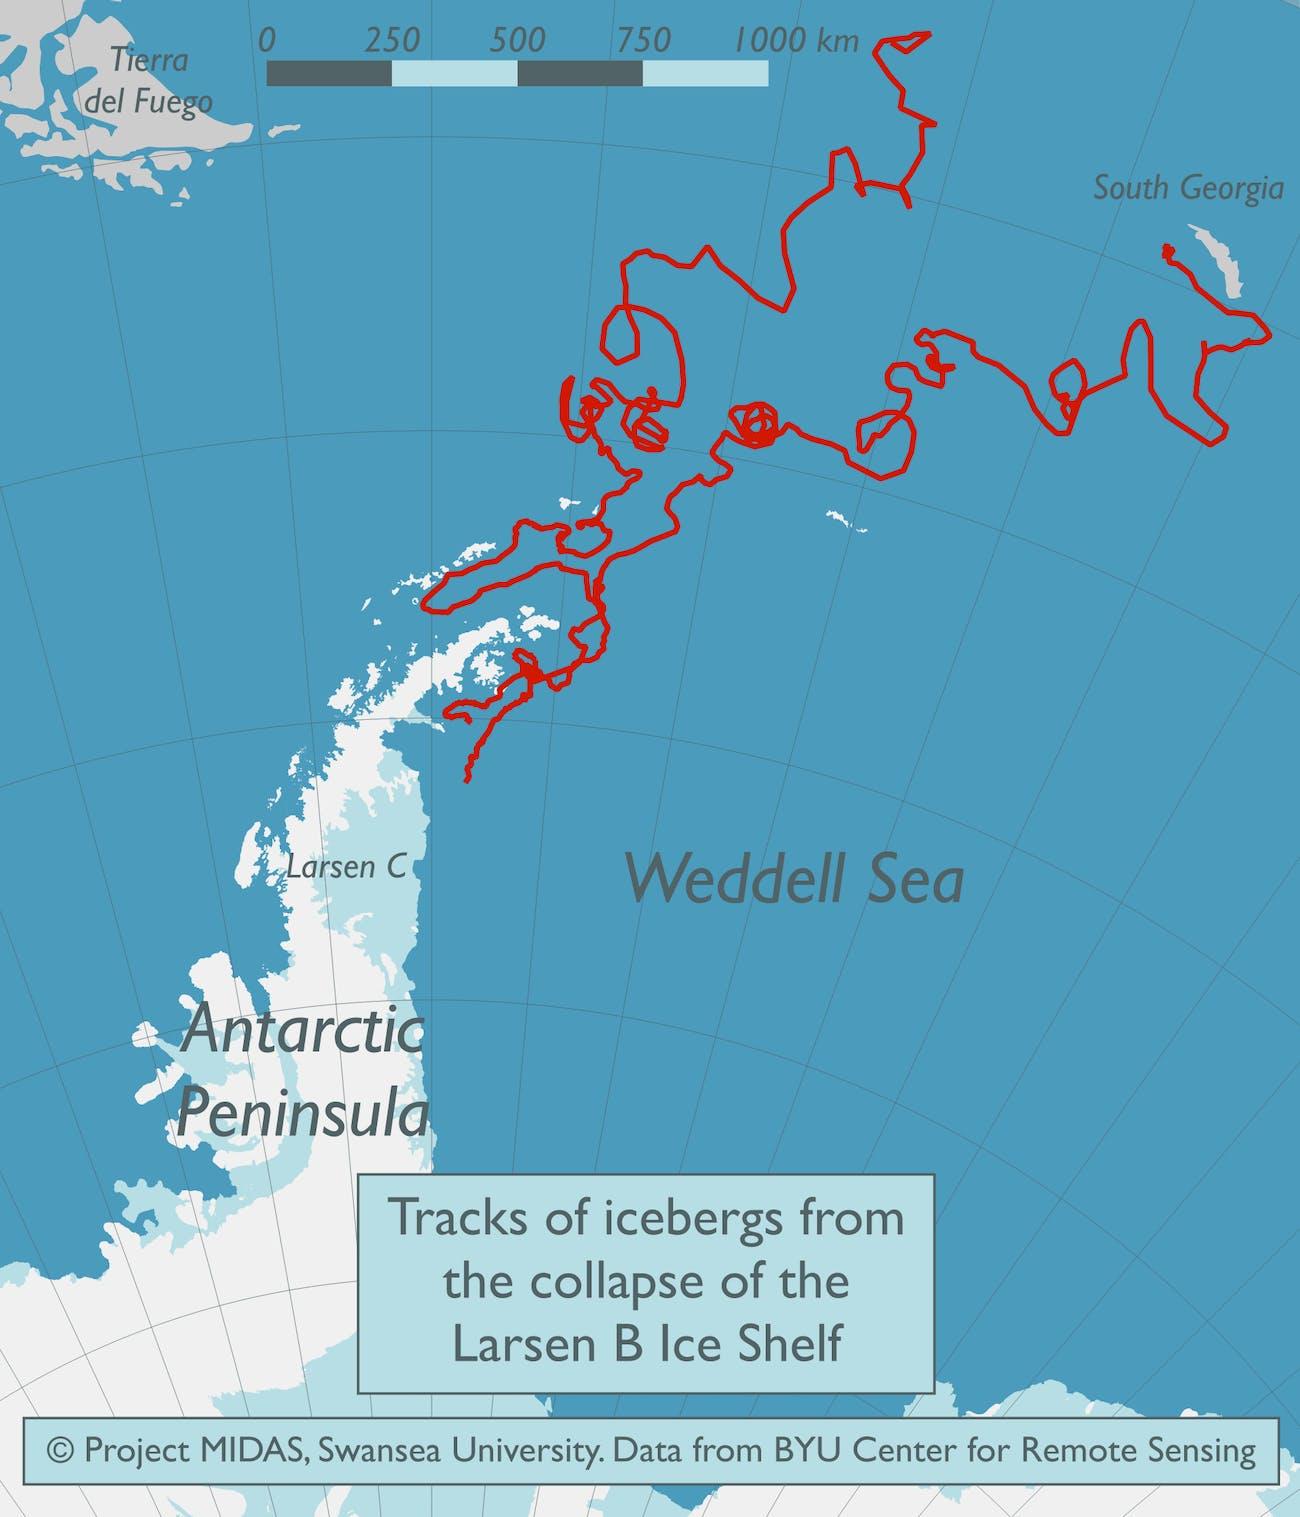 antarctica larsen c A68 where will it go